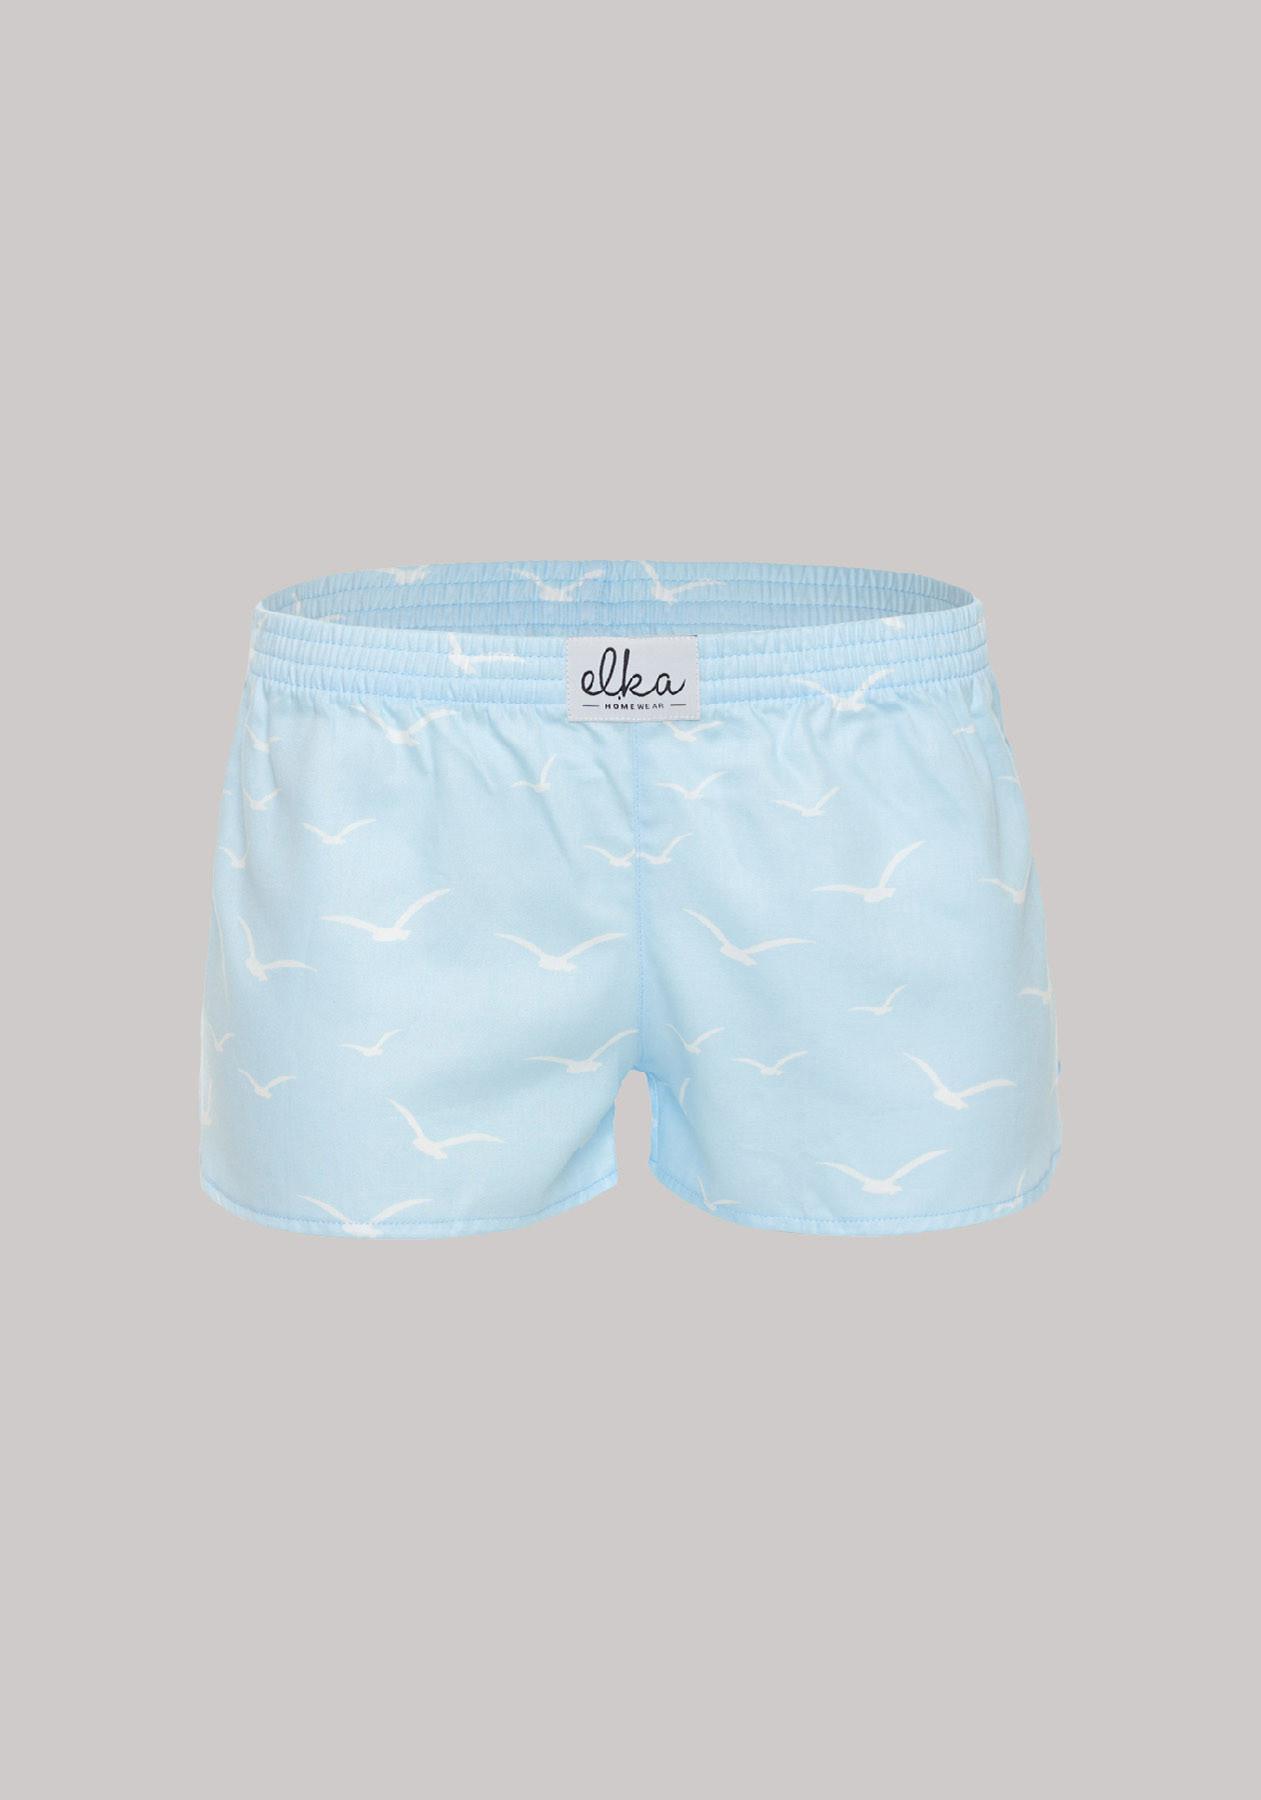 Women-Boxershorts-ELKA-Lounge-W00491